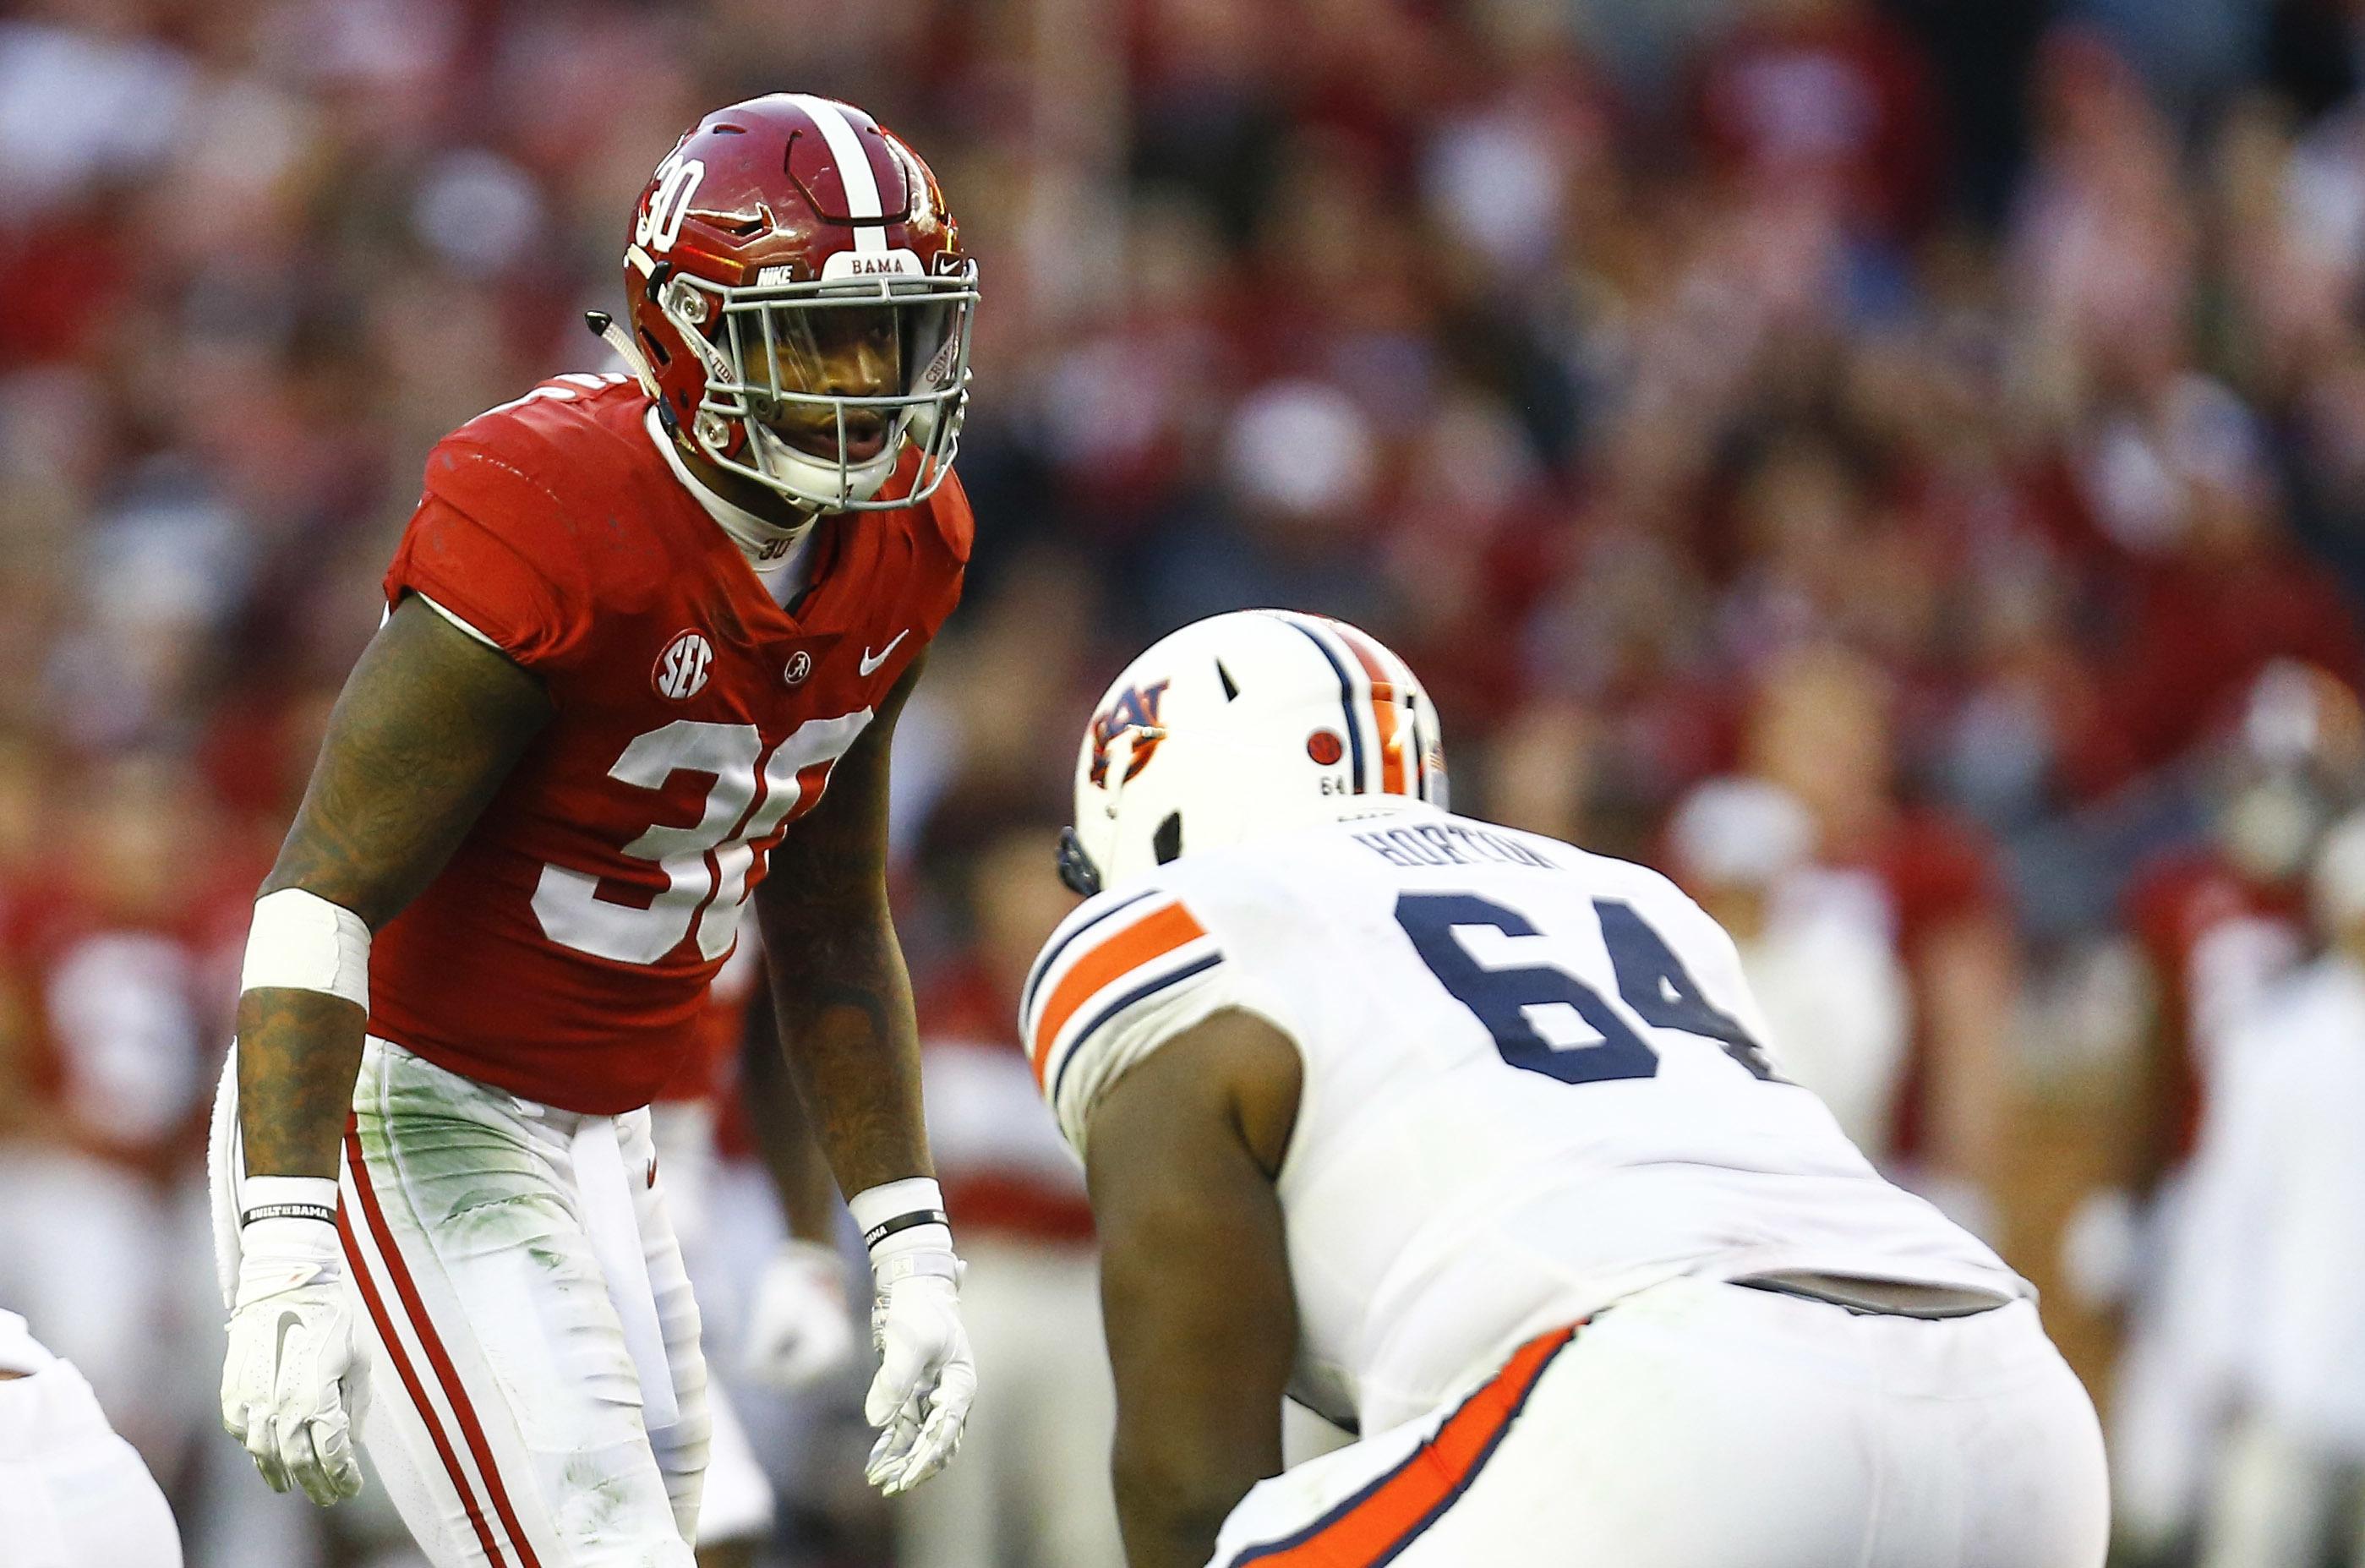 d635b14ca Alabama linebacker Mack Wilson (30) has seen his stock slip since declaring  for the draft.(Associated Press)